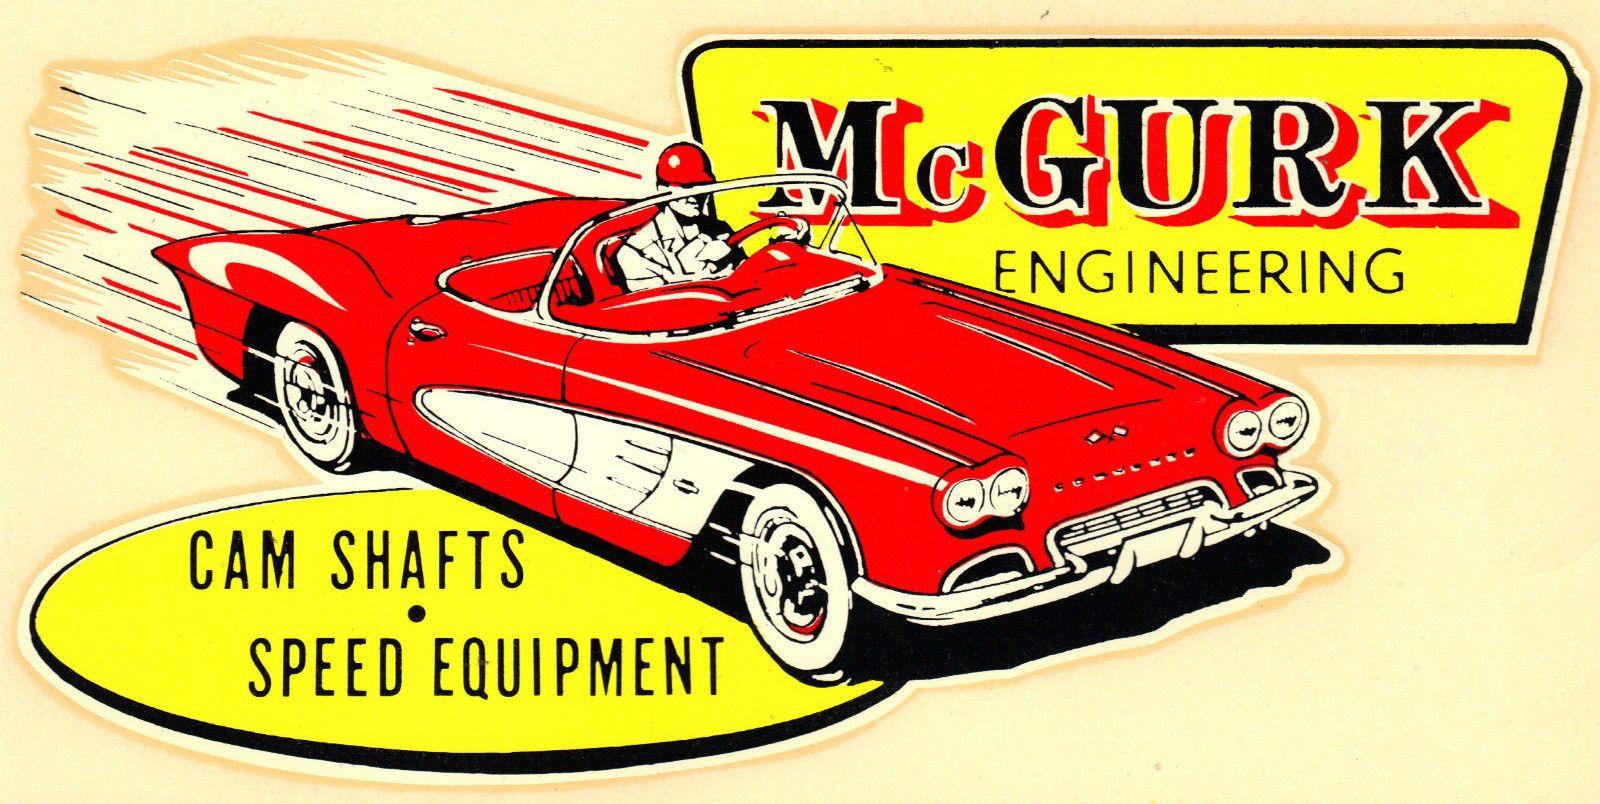 Original Vintage Mcgurk Decal Hot Rod Corvette Rat Custom Gasser Drag Racing Old Hot Rods Vintage Racing Racing